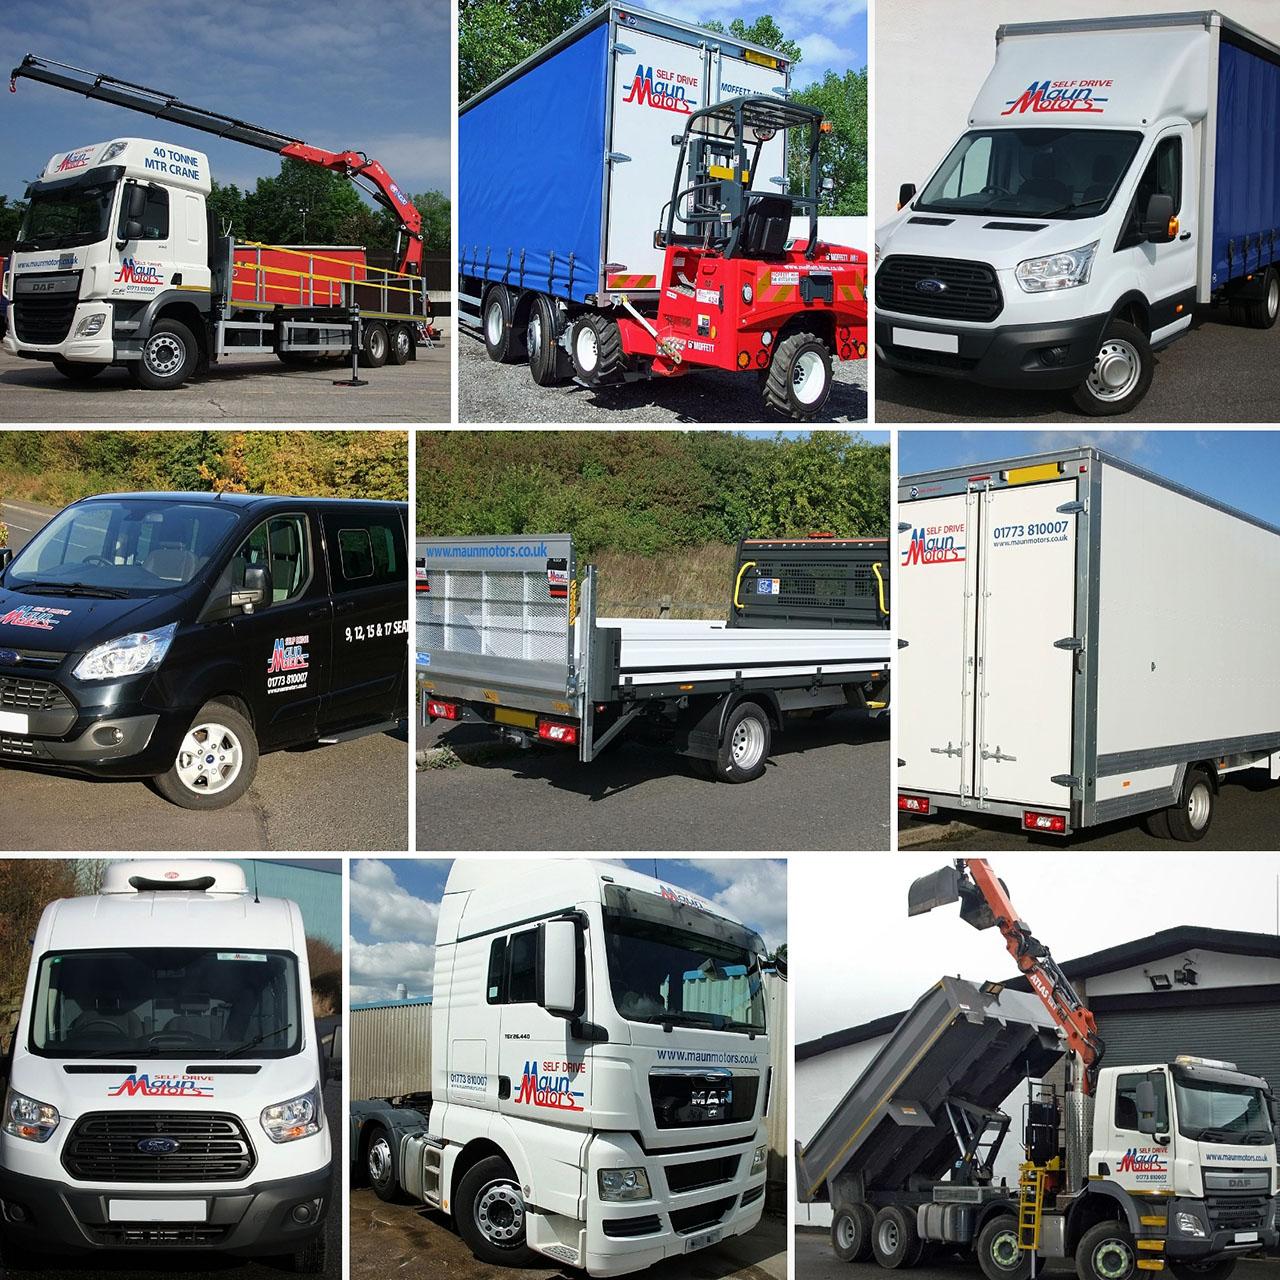 Cole Hire Self Drive Vans: Van Hire South Normanton